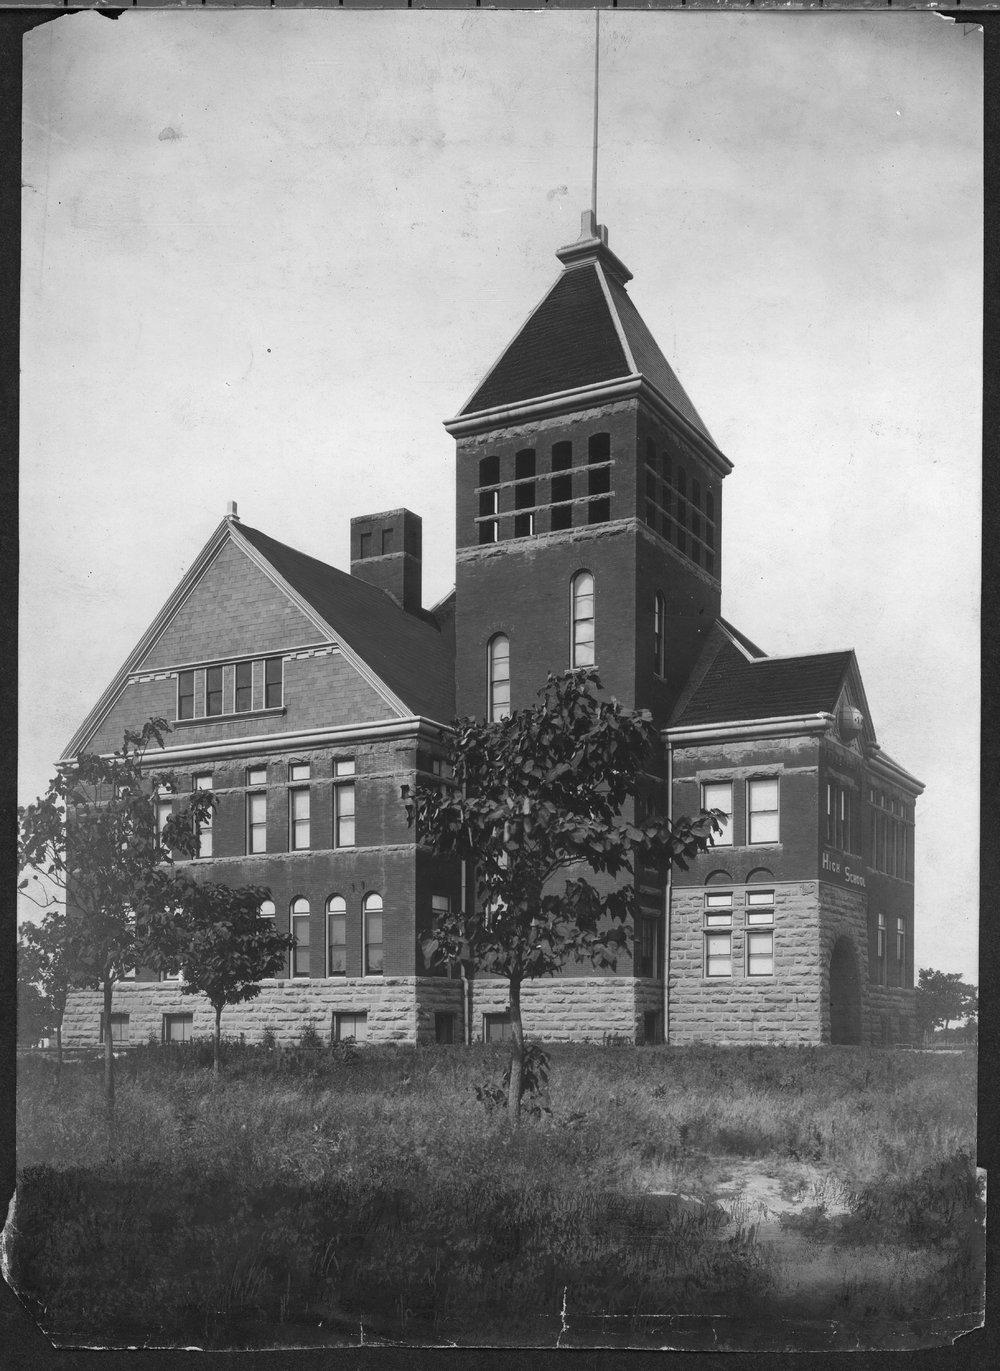 High school building in Parsons, Kansas - 2